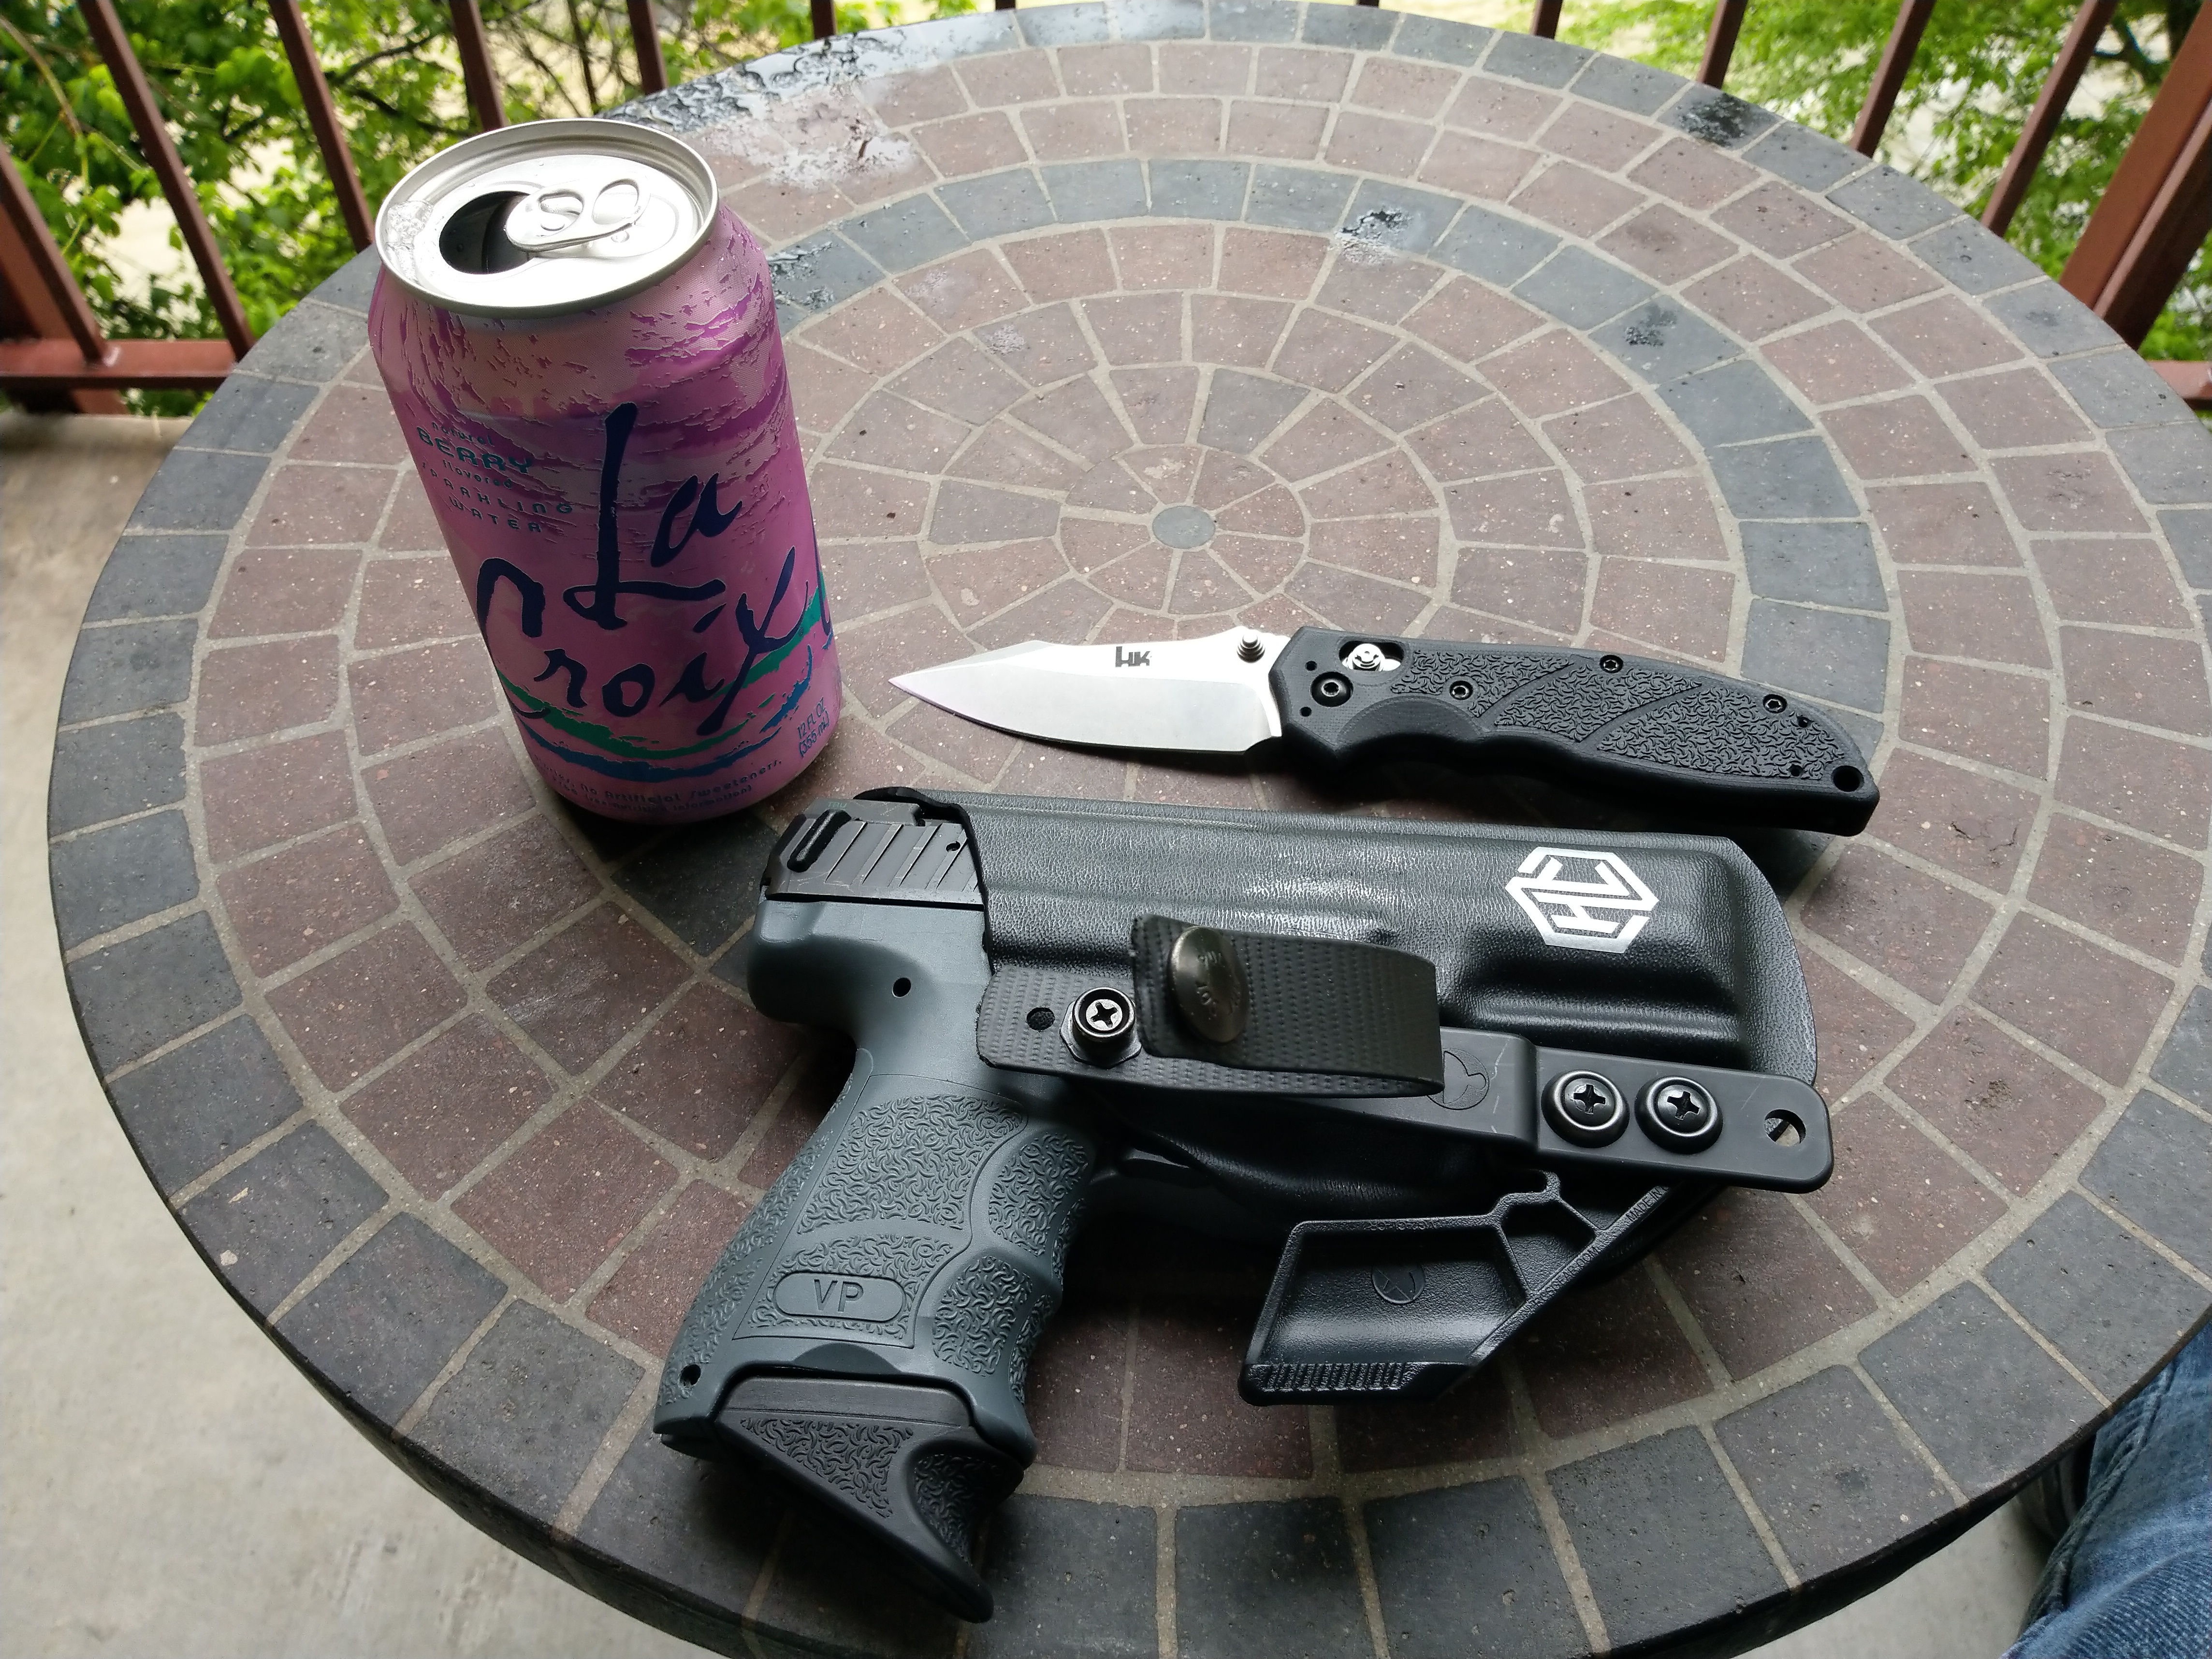 New HK Knives coming up-imag1827.jpg